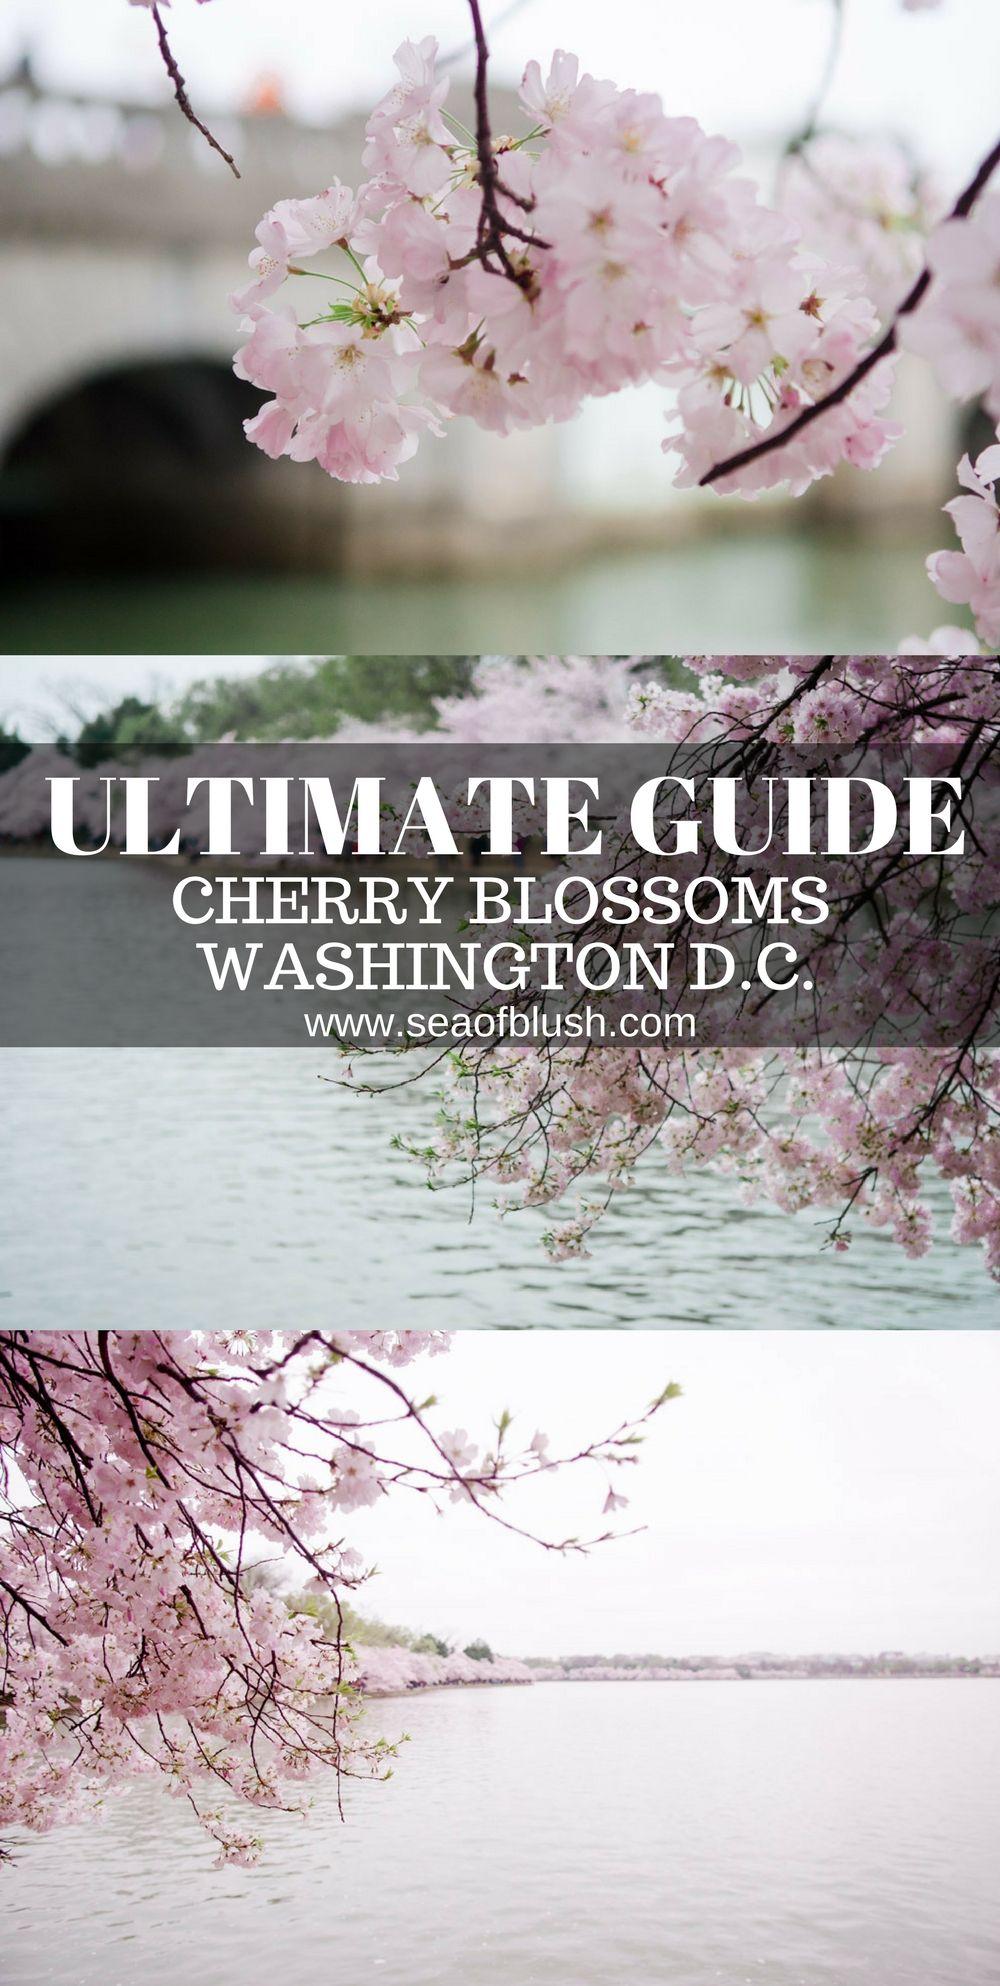 The 2021 Guide To Washington Dc Cherry Blossom Peak Bloom Usa Travel Destinations North America Travel Usa Travel Guide